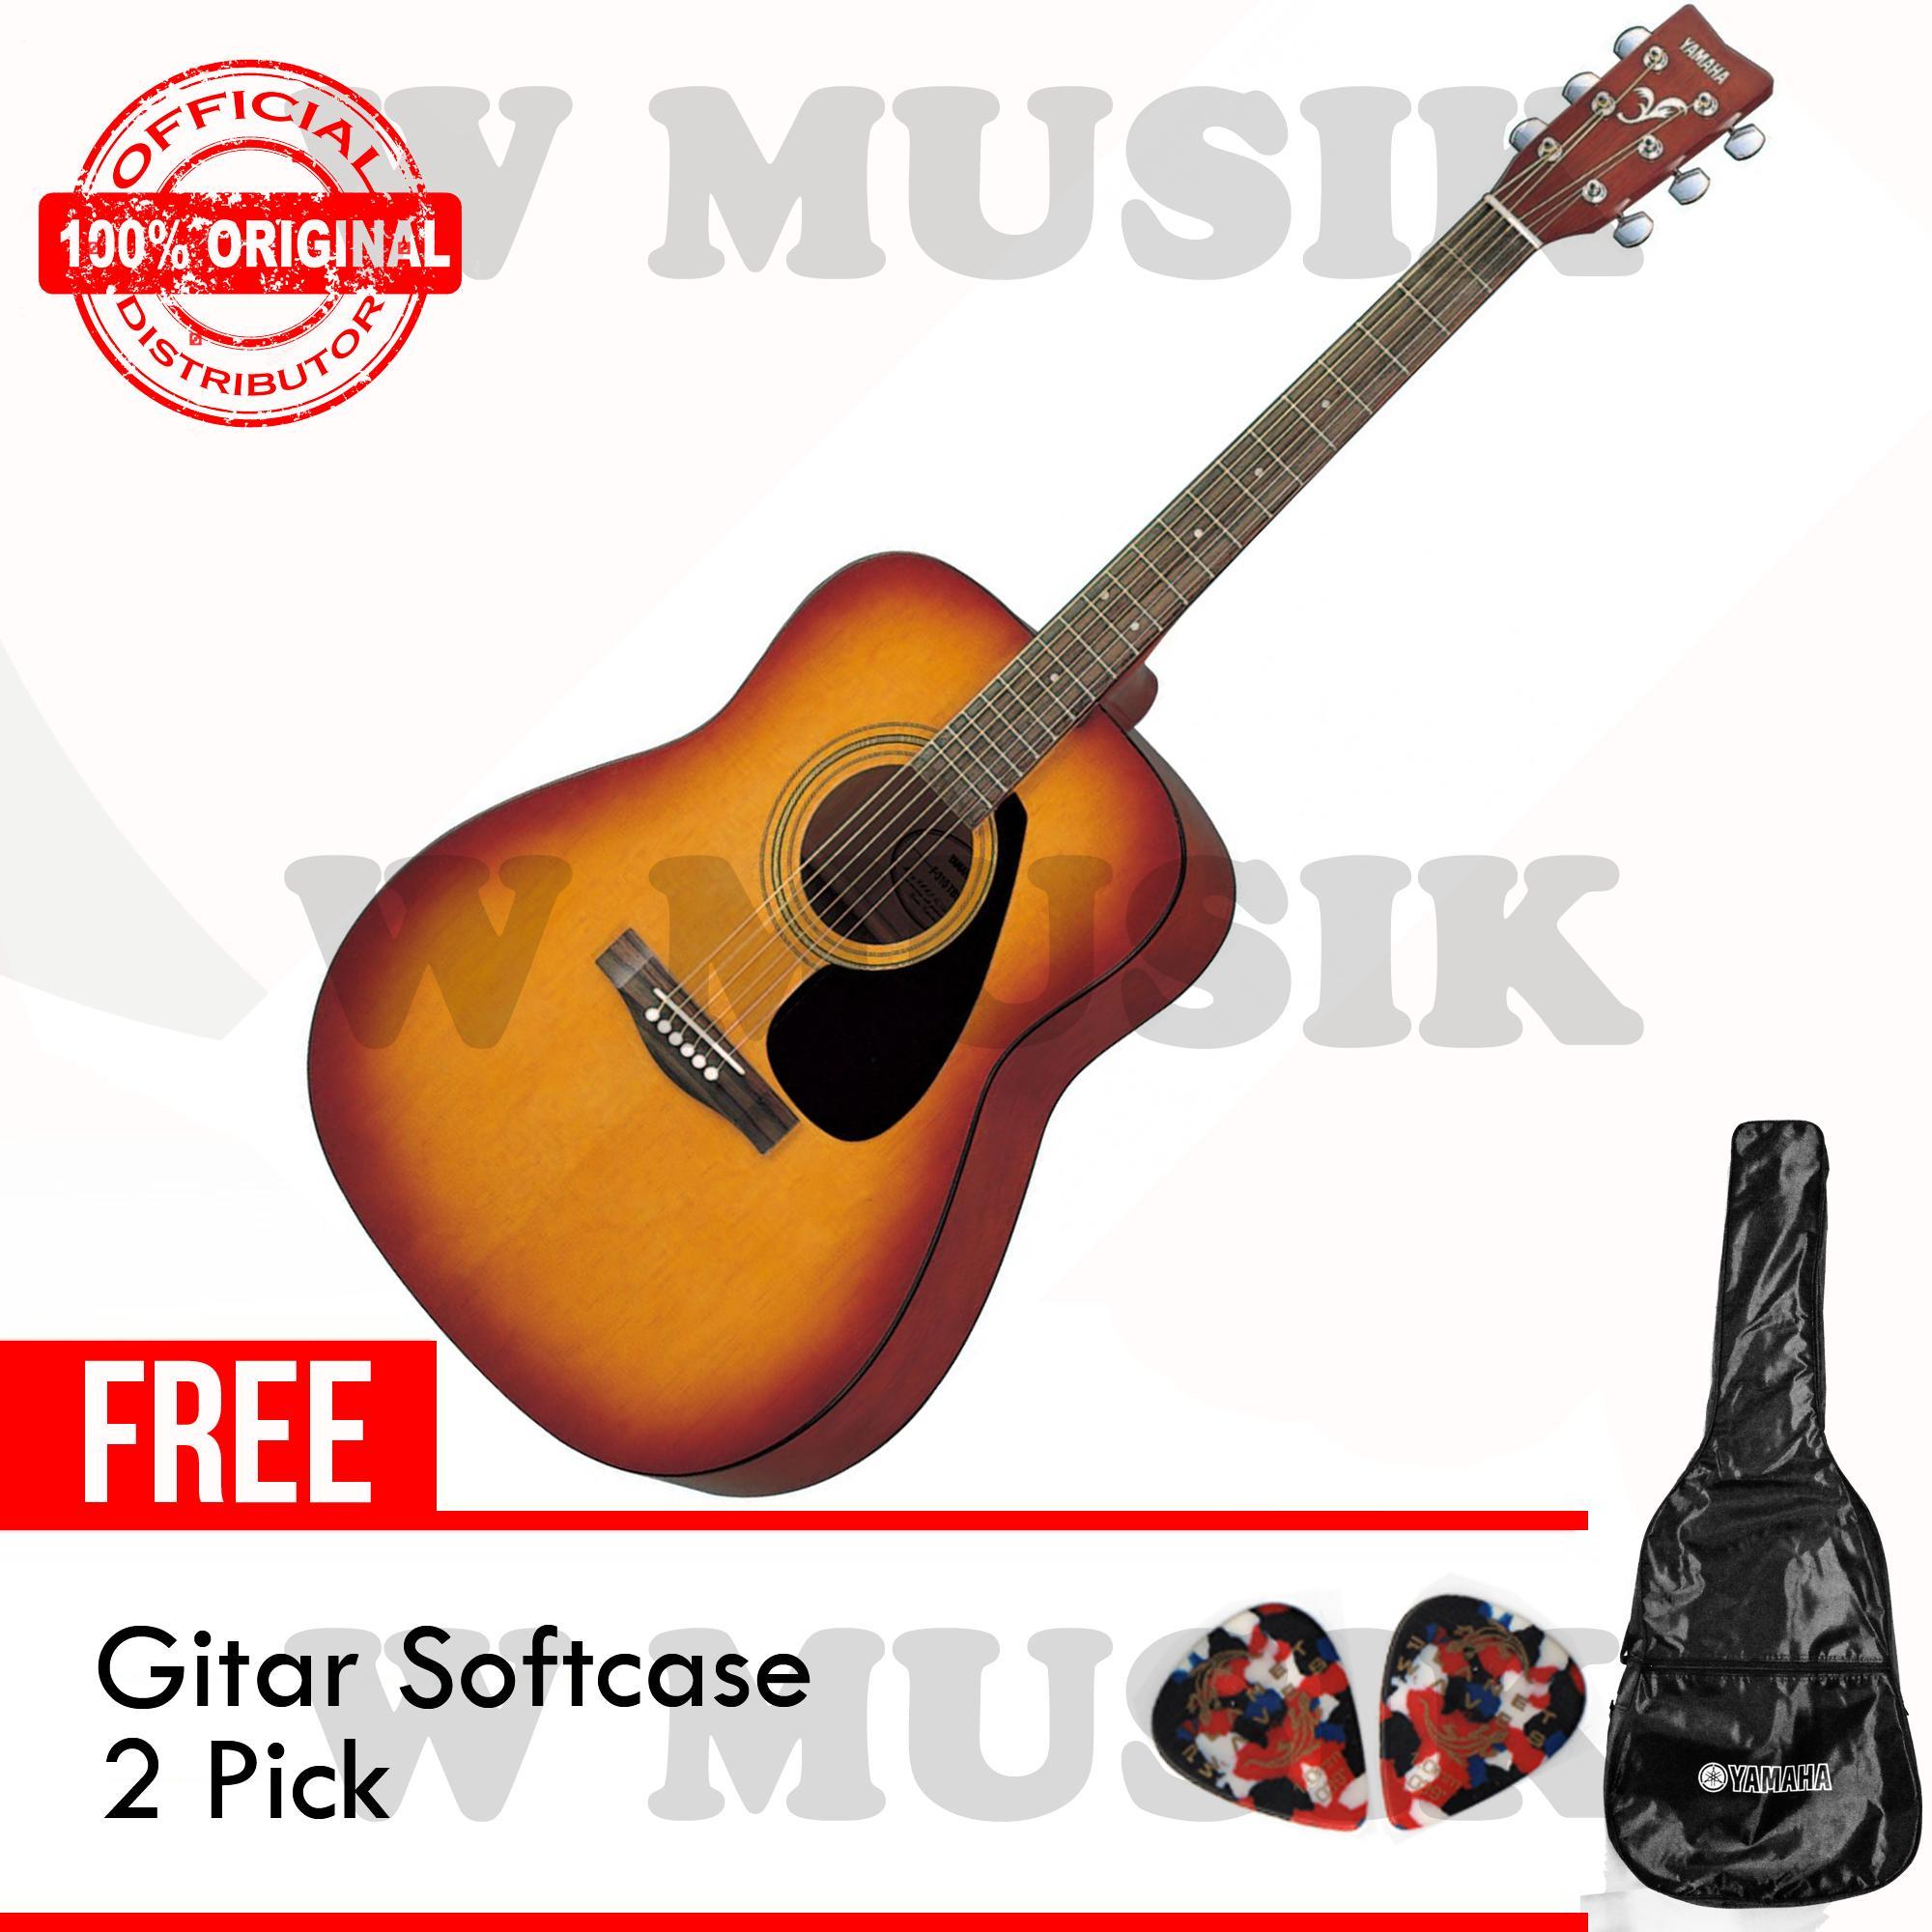 Yamaha Gitar Akustik Folk F-310 / F310 / F 310 / F310TBS - Tobacco Brown Sunburst + Gratis Softcase & 2 Pick